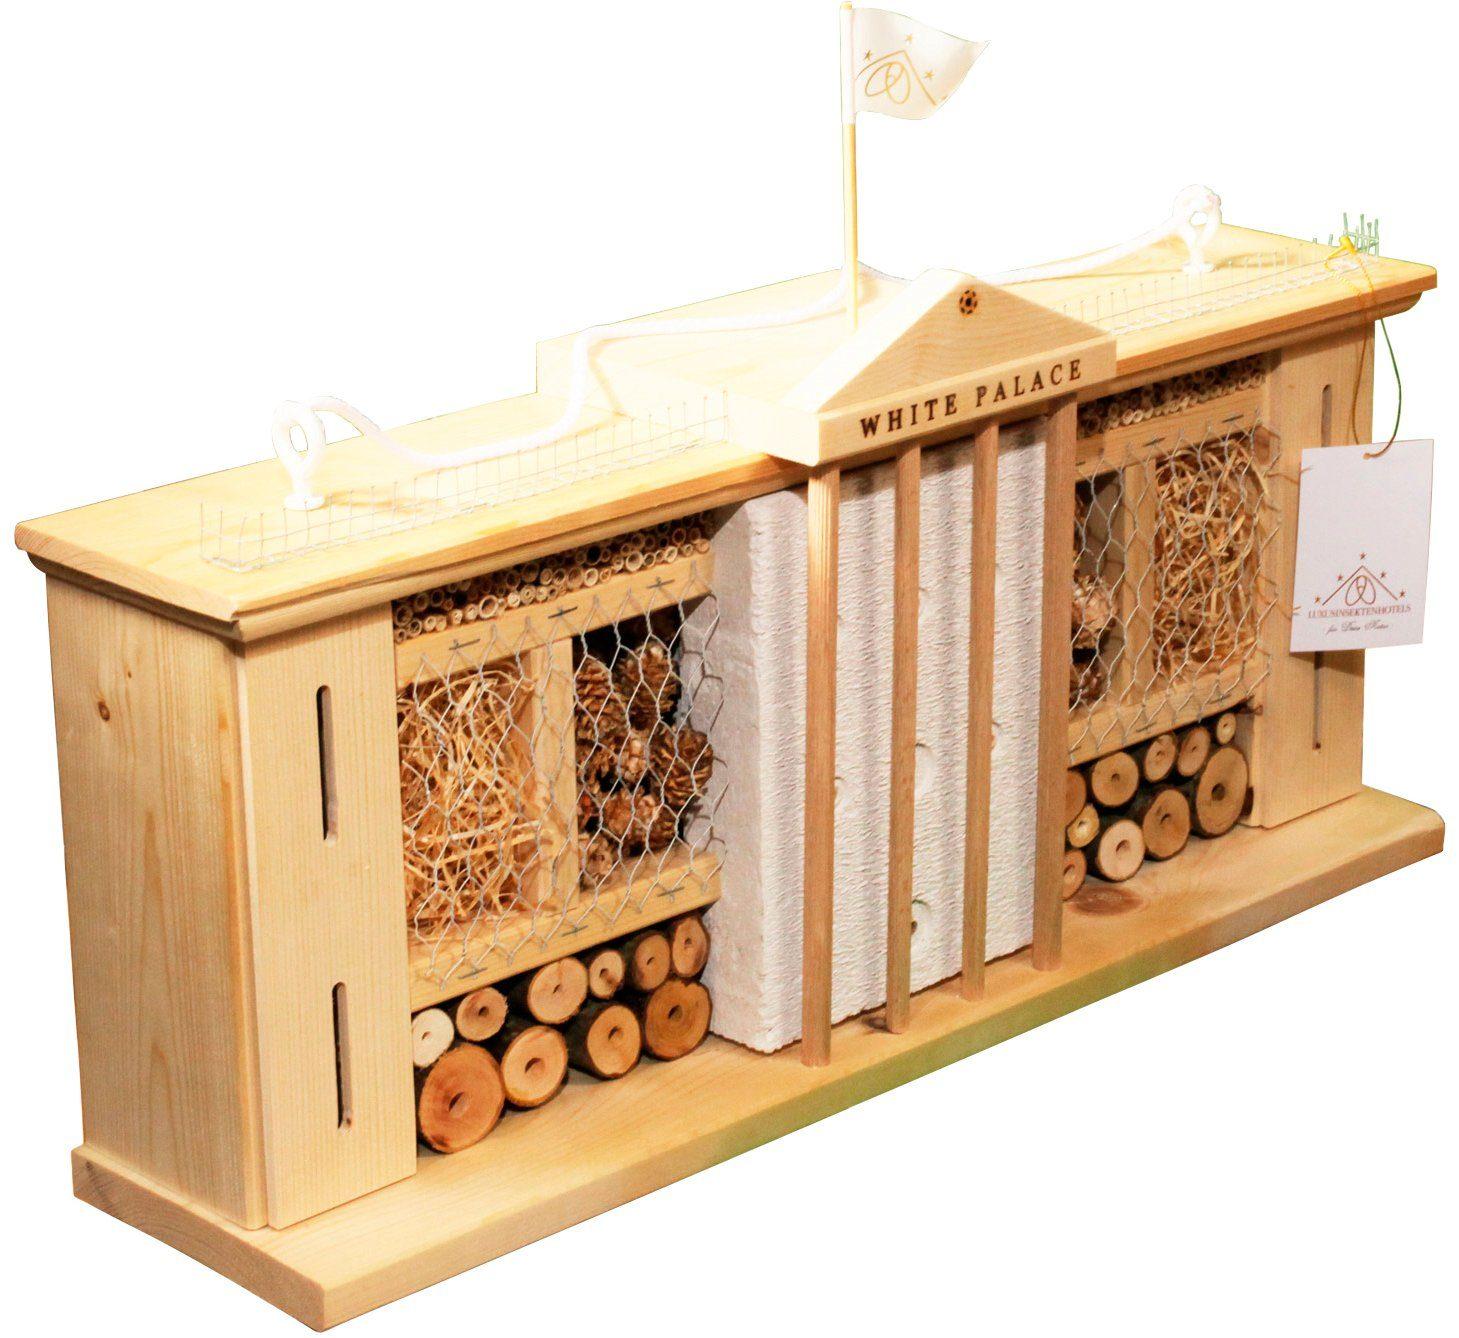 LUXUSINSEKTENHOTELS Insektenhotel »Weißer Palast«, BxTxH: 58x12x30 cm